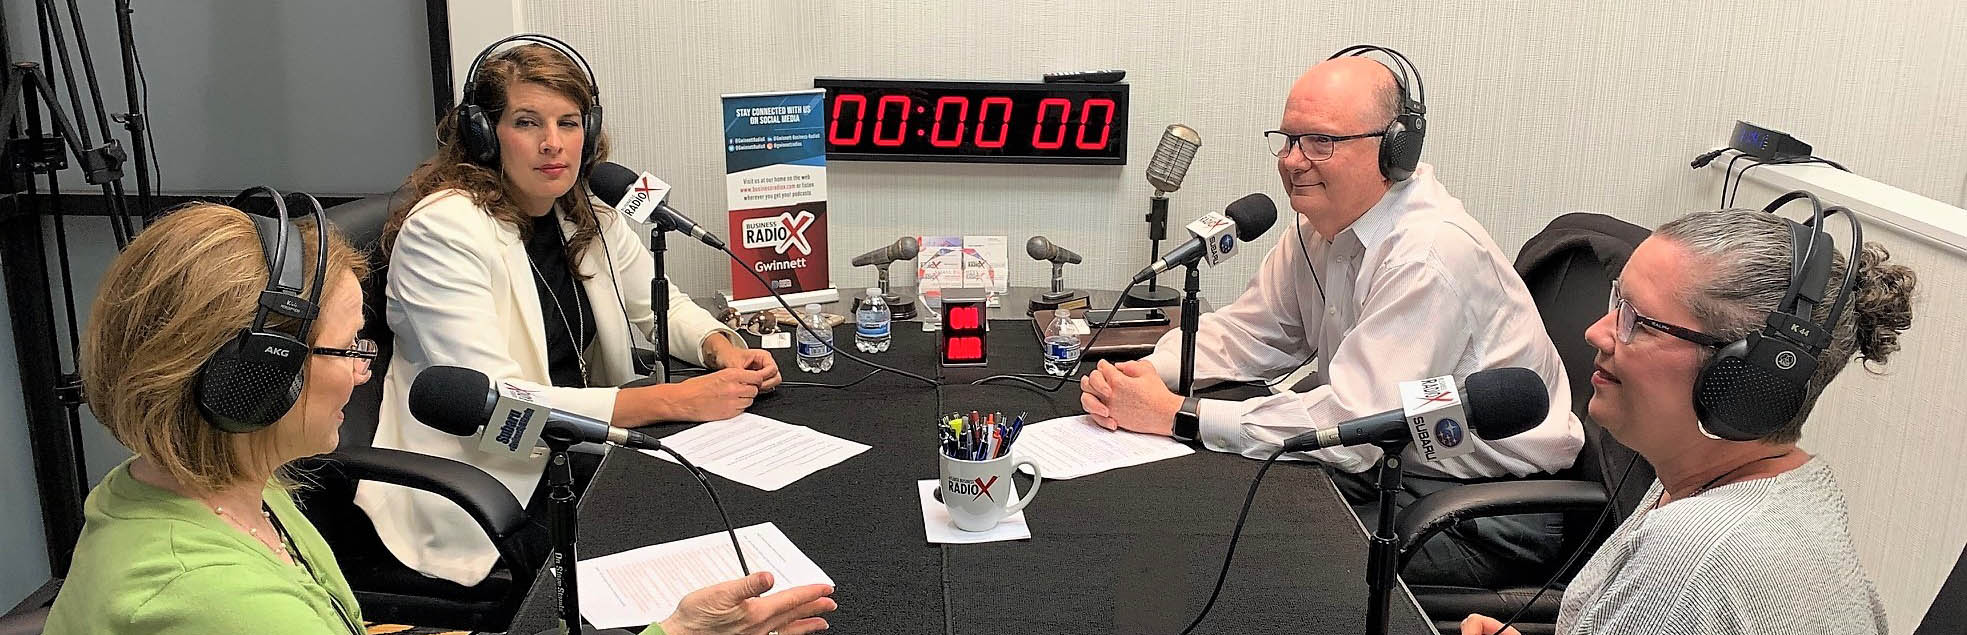 In-studio Podcast Recoriding